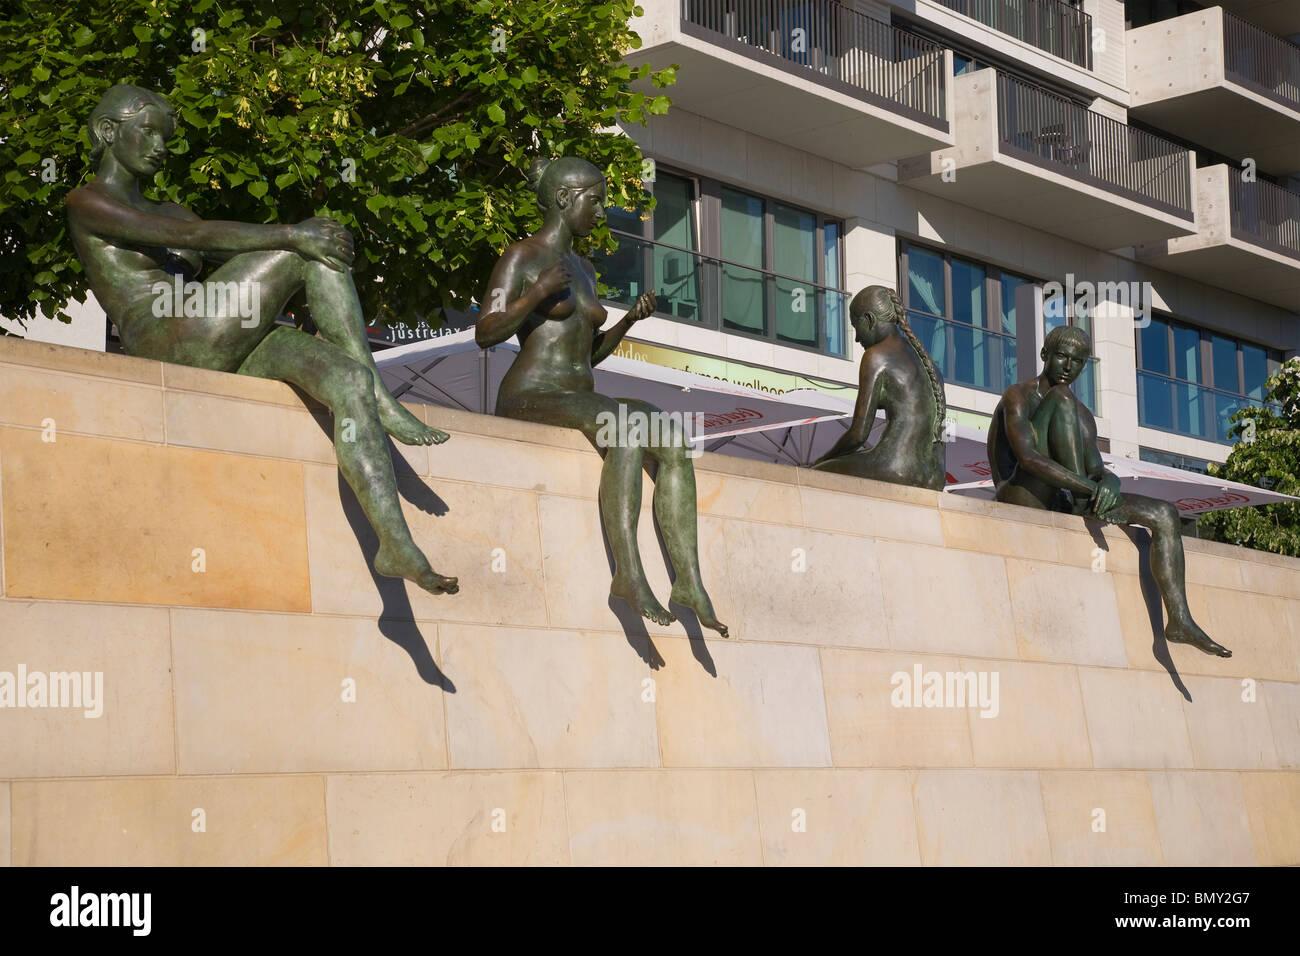 Sunbather statues by River Spree, Berlin, Germany - Stock Image